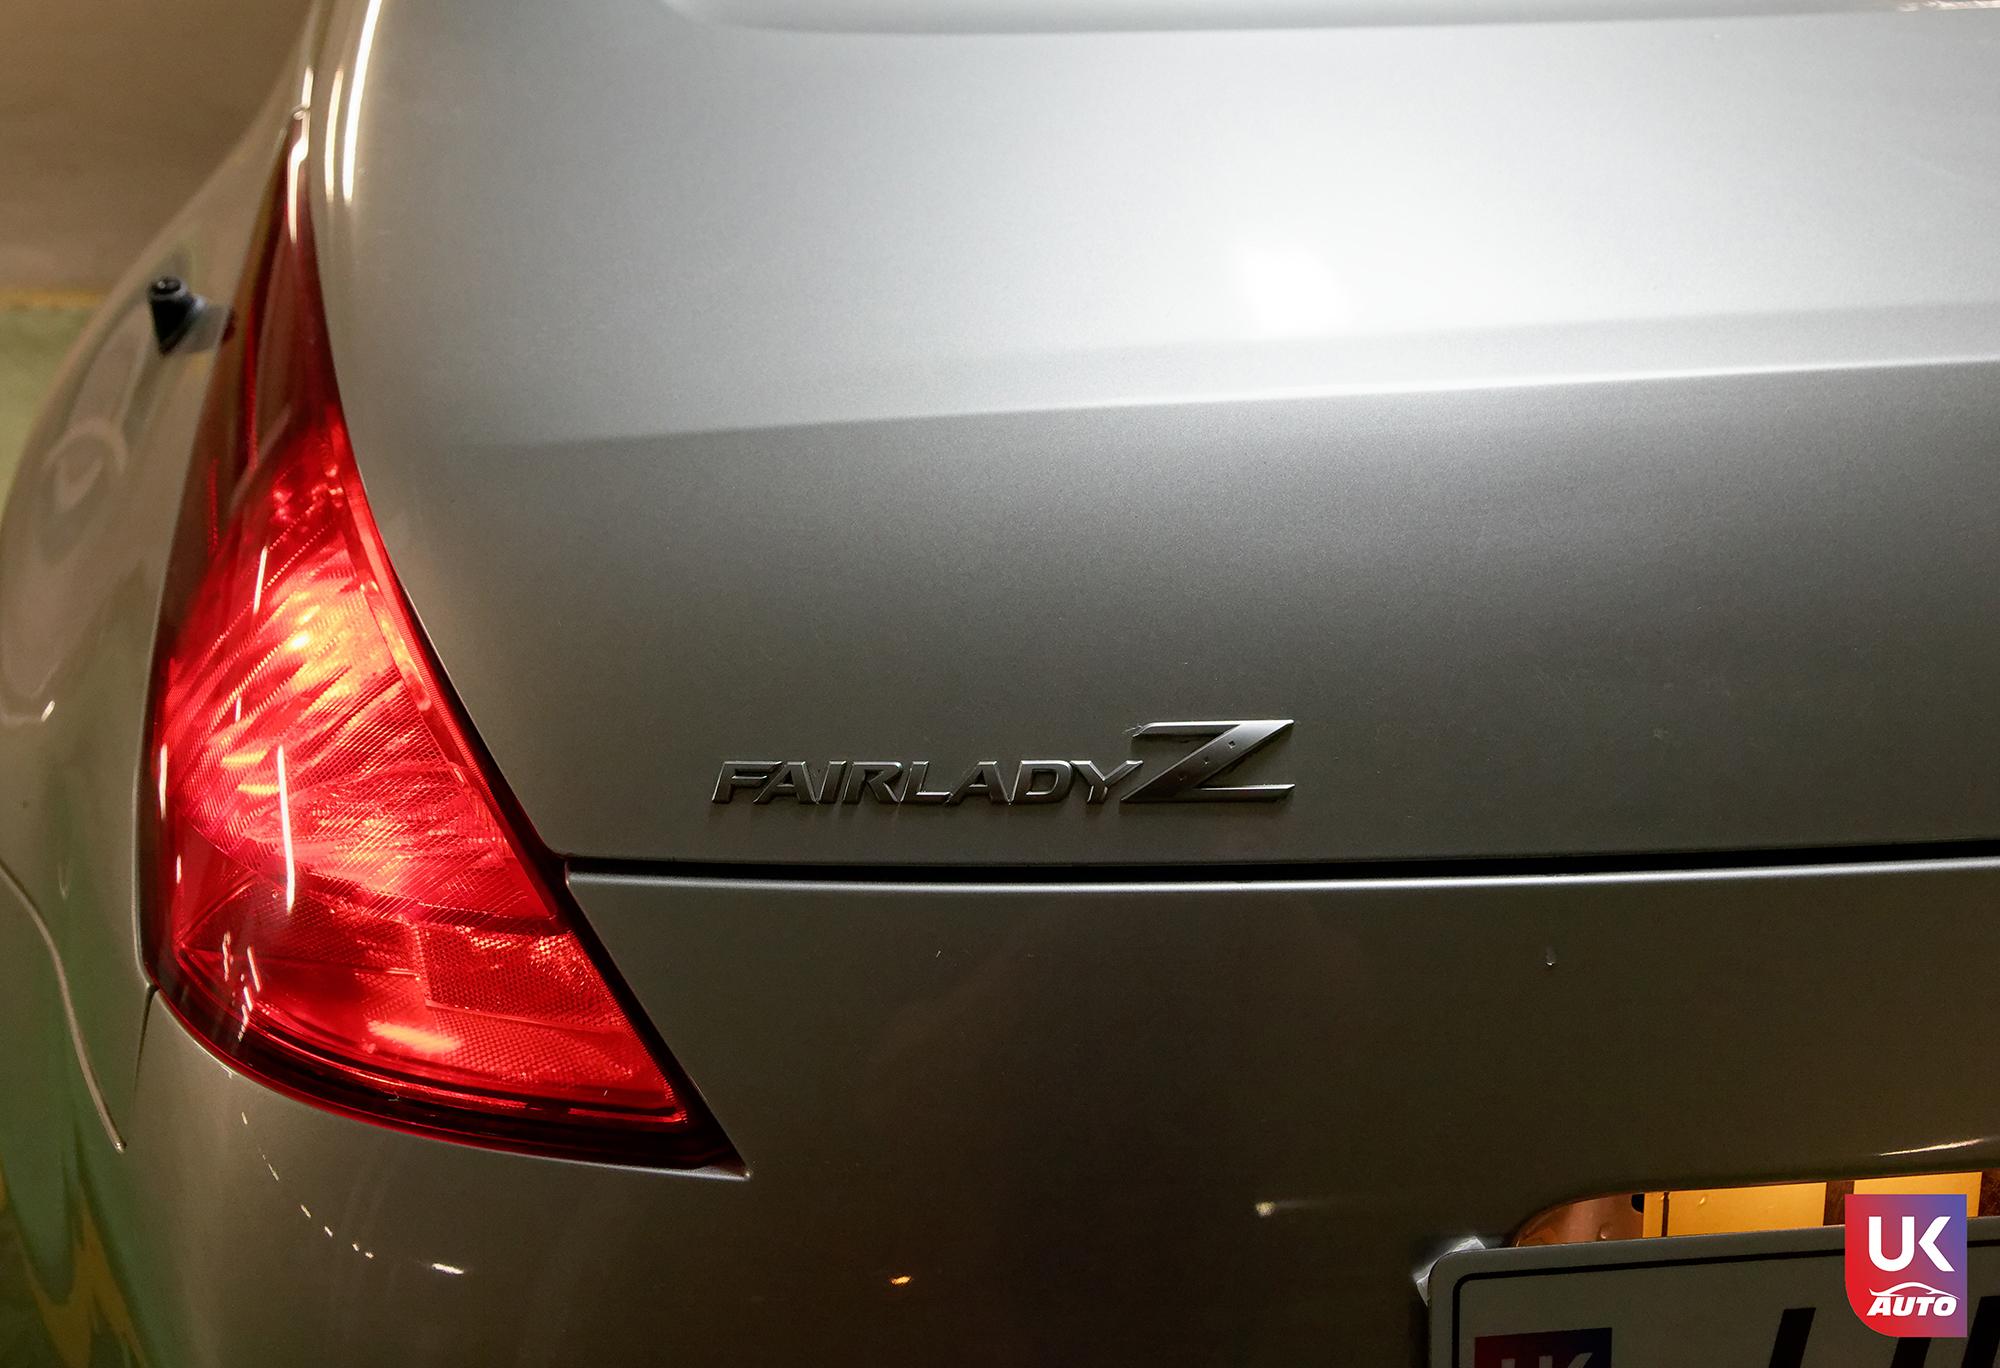 Ukauto import nissan 350z jdm import fairlady v6 import uk ukauto rhd nissan import uk7 - Import Nissan 350Z JDM IMPORT 3.5 V6 TIPTRONIC IMPORT AUTO par UKAUTO